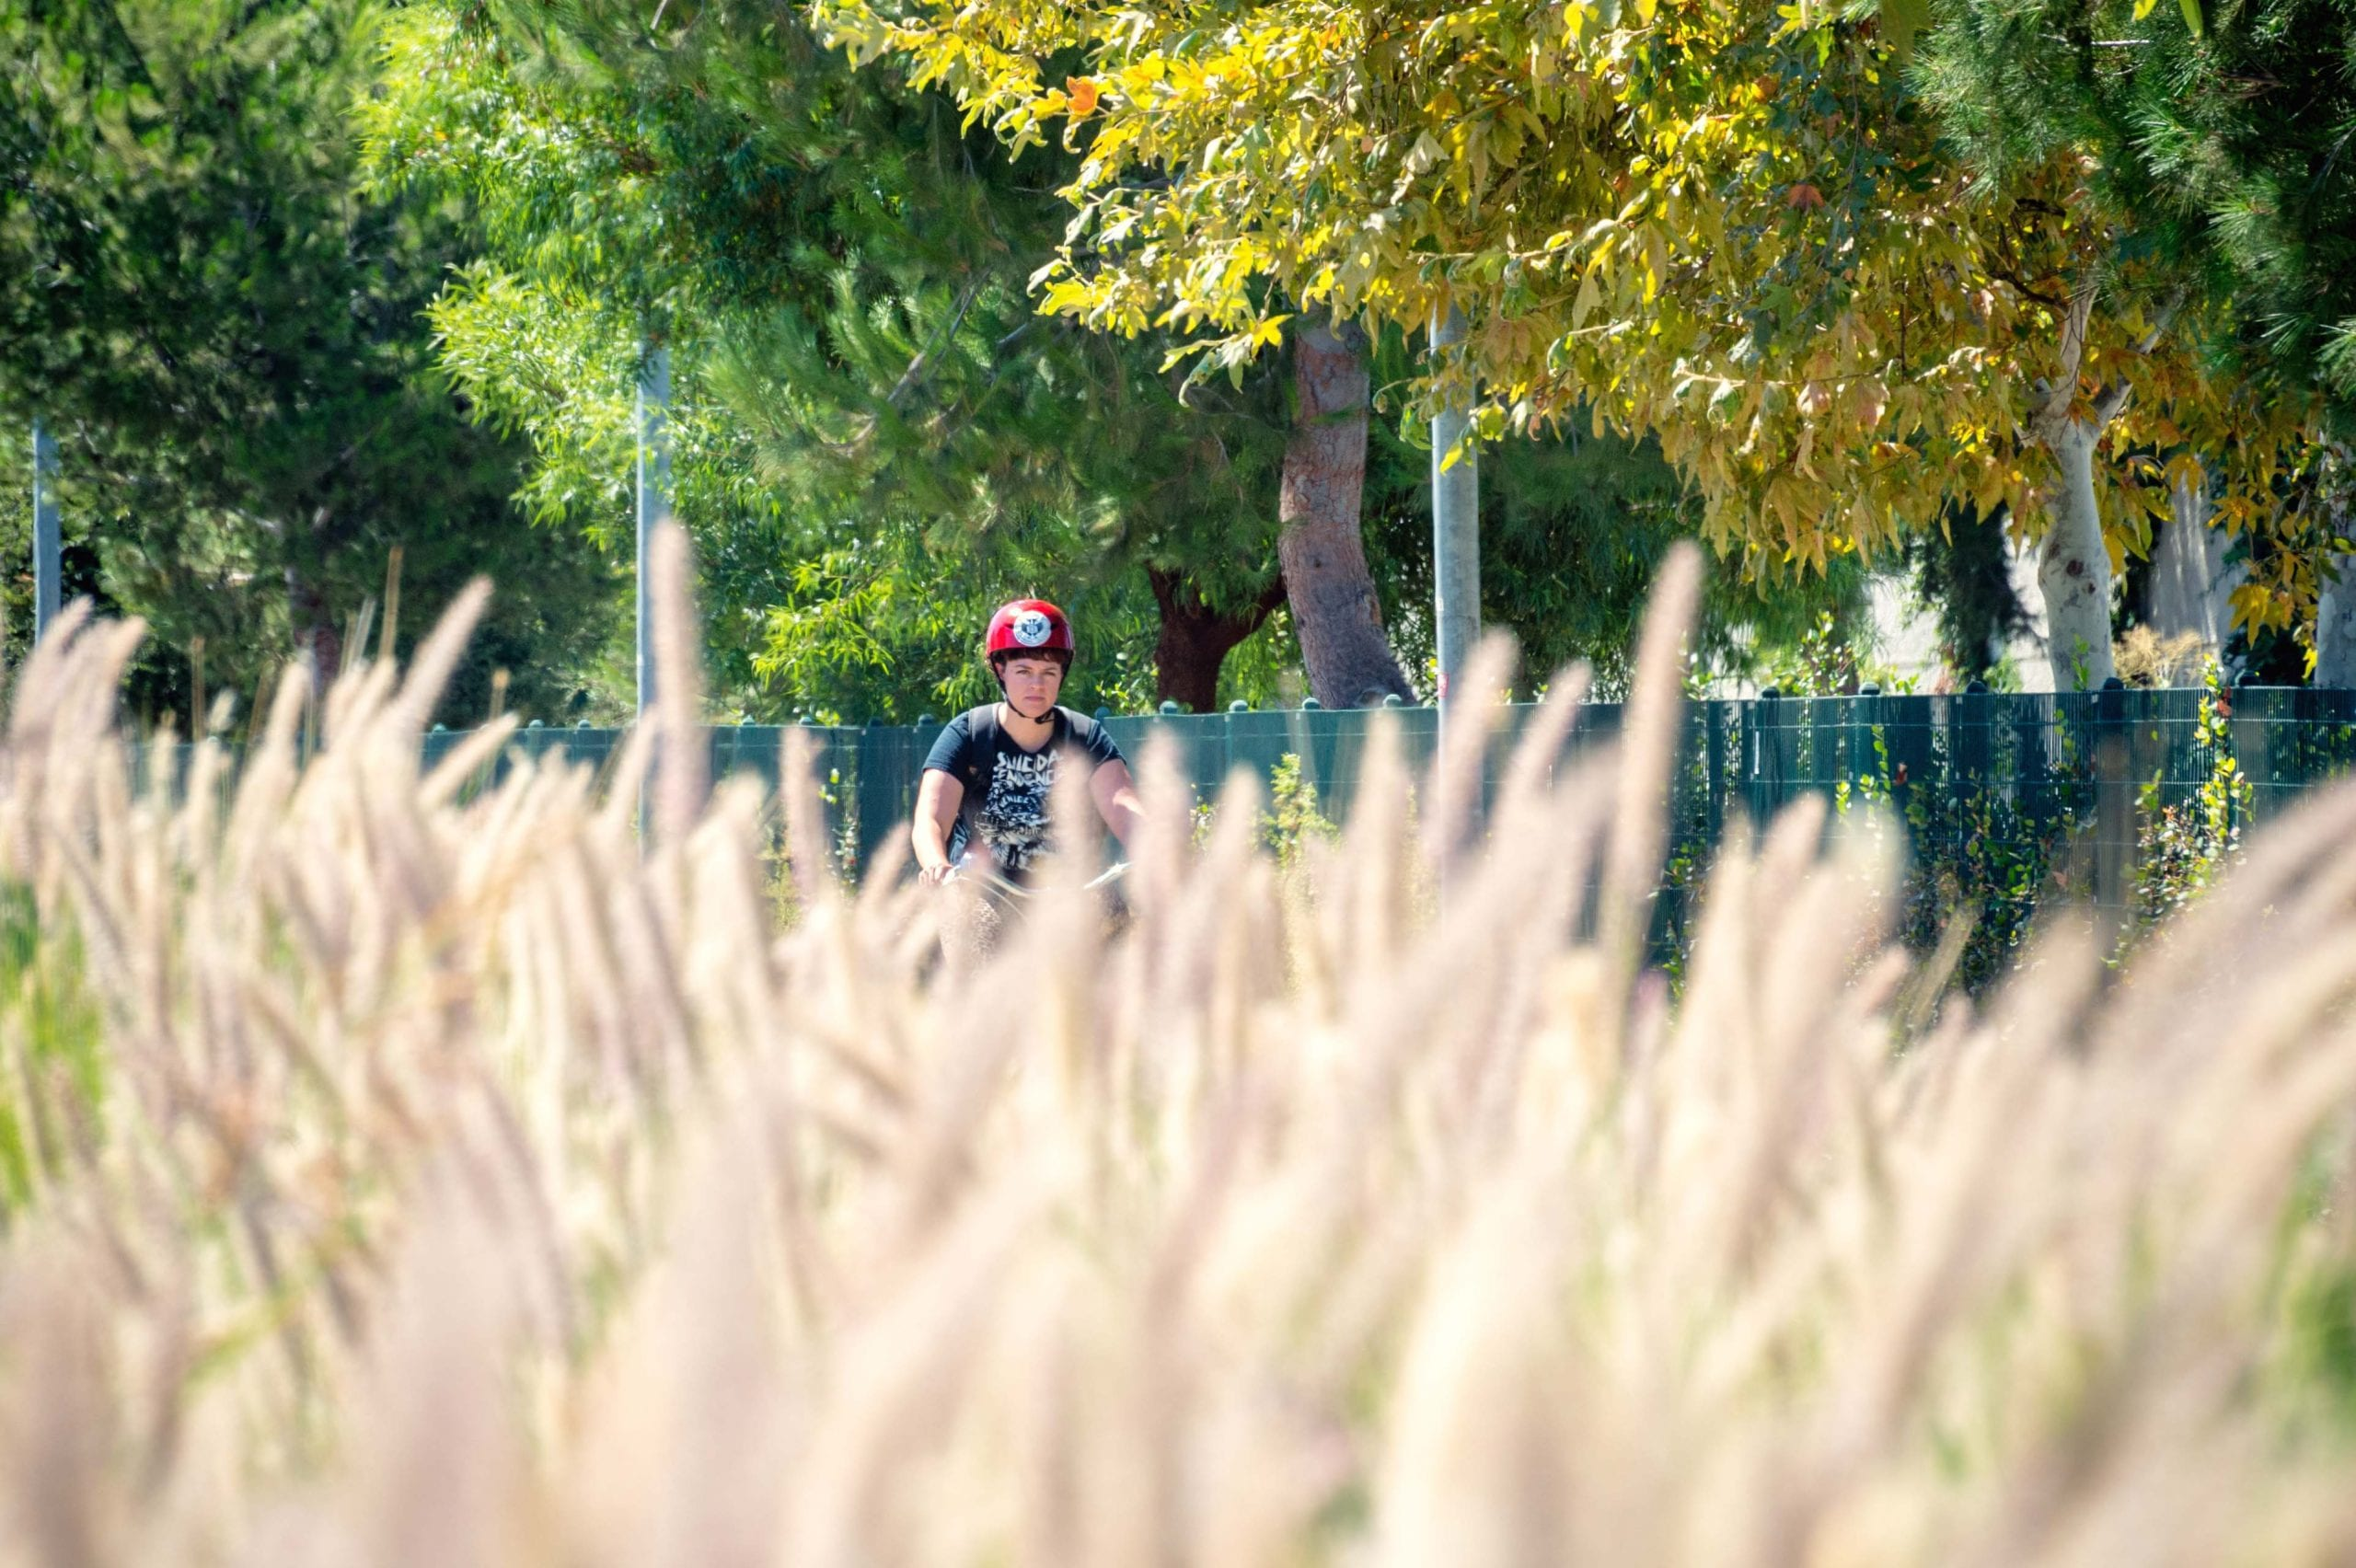 A cyclist on the Orange Line bike path last summer. Photo by Steve Hymon/Metro.